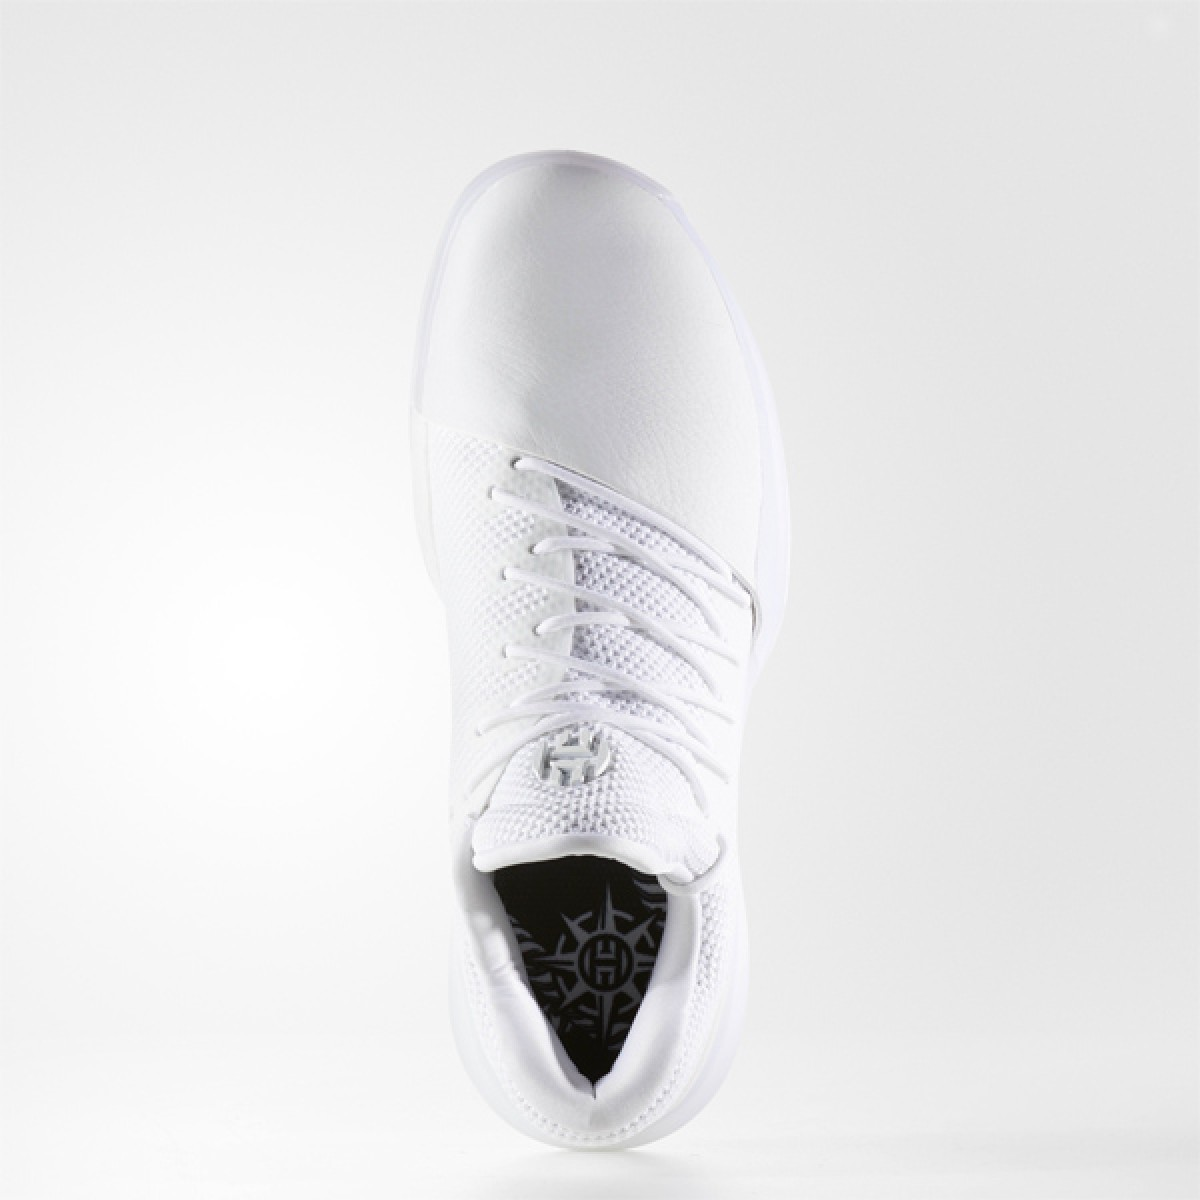 Adidas Harden Vol. 1 J 'Yacht Party' BW1110